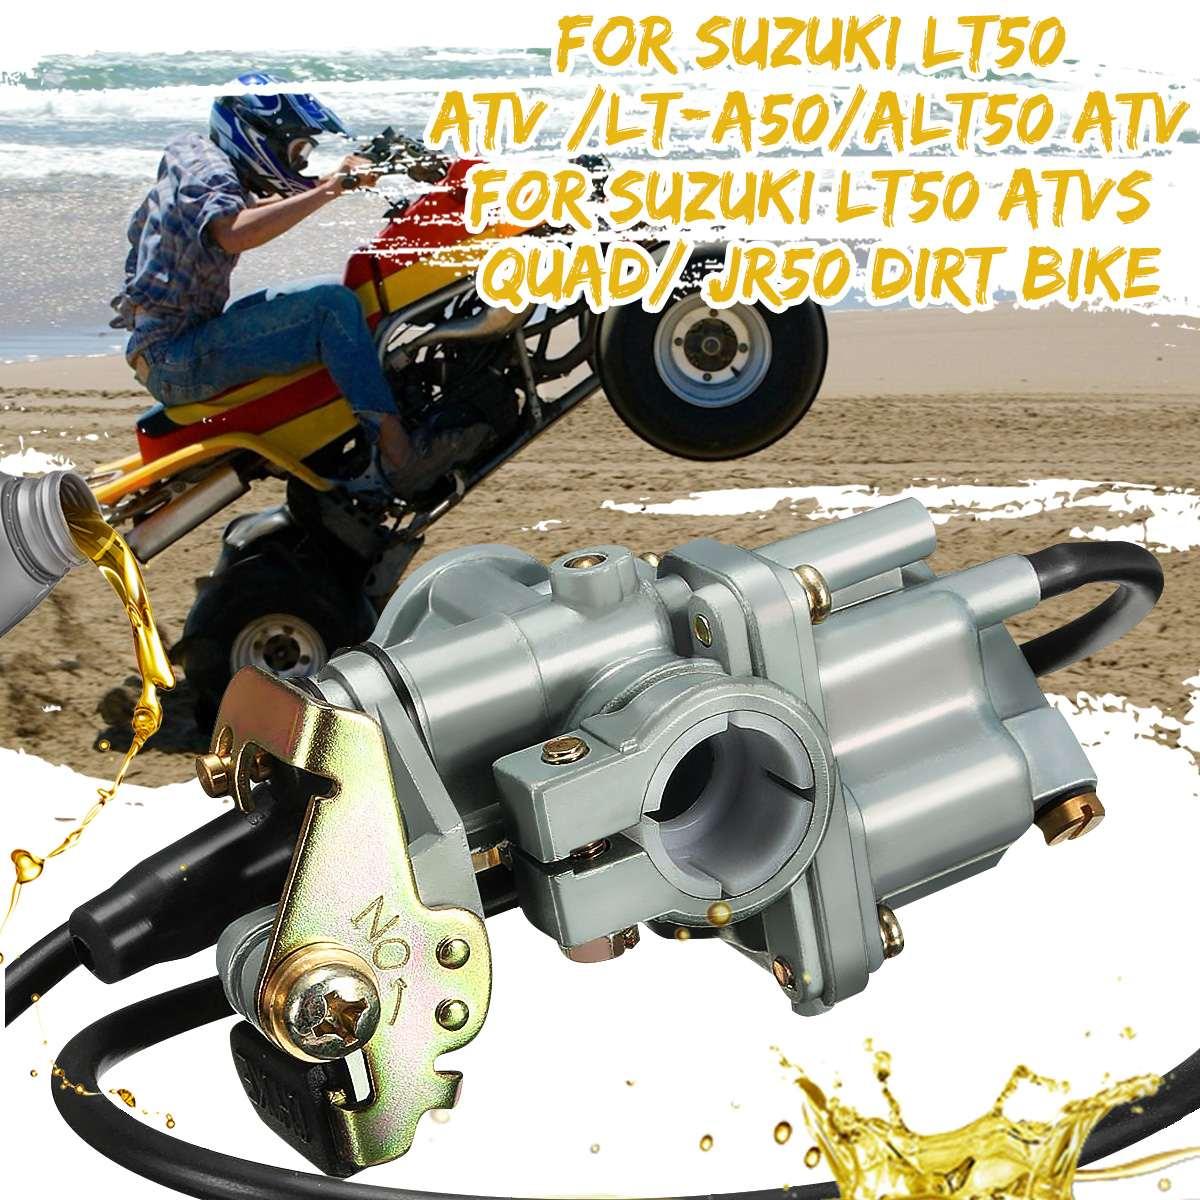 CLUTCH FRICTION PLATES and SPRINGS Fits SUZUKI LT-Z400 QuadSport Z400 2X4 03-13